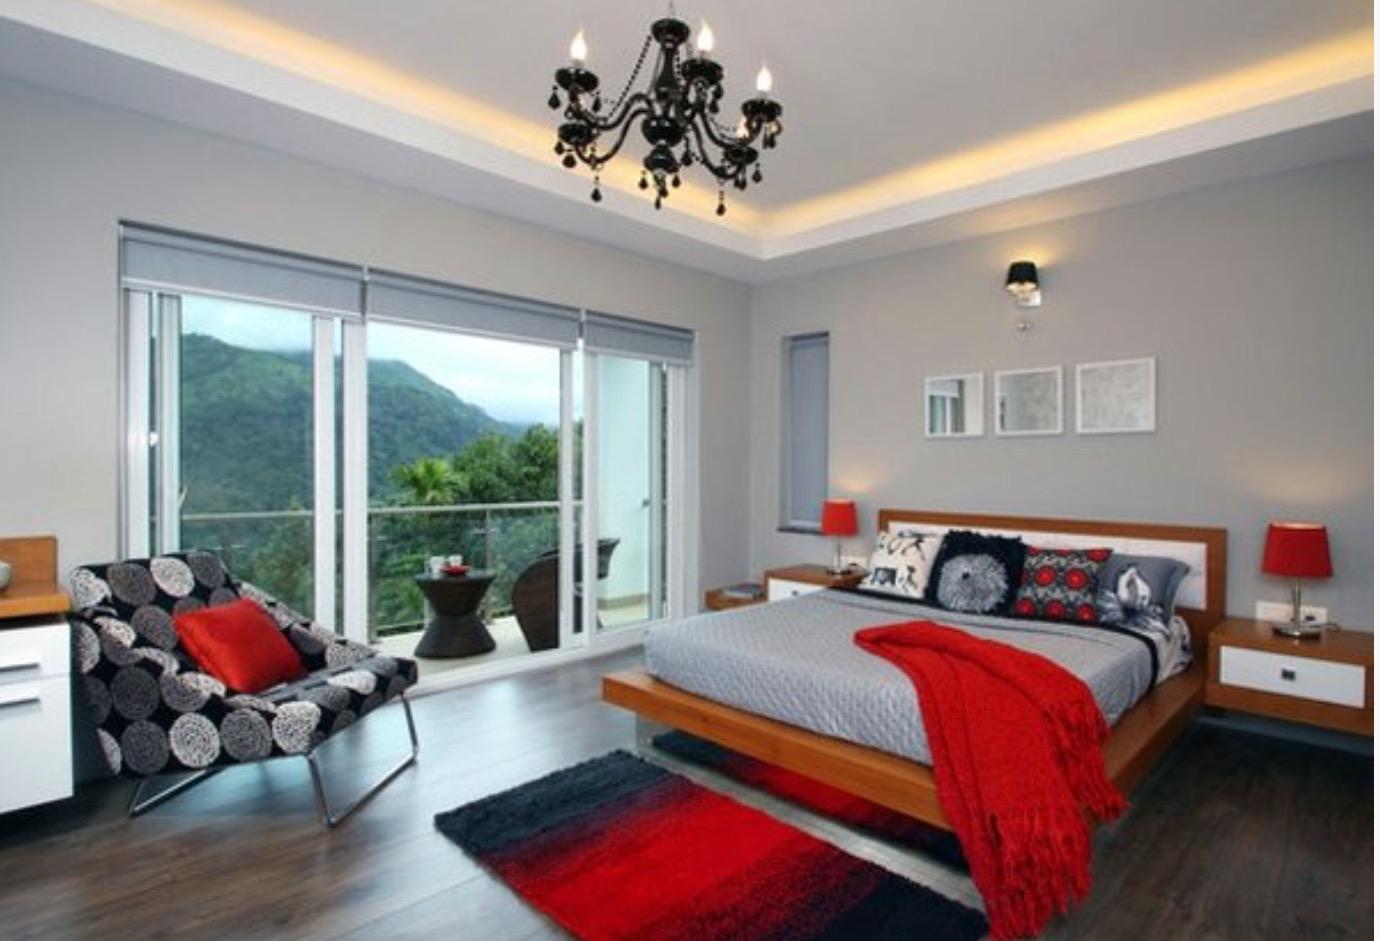 ideale farbe im schlafzimmer. Black Bedroom Furniture Sets. Home Design Ideas